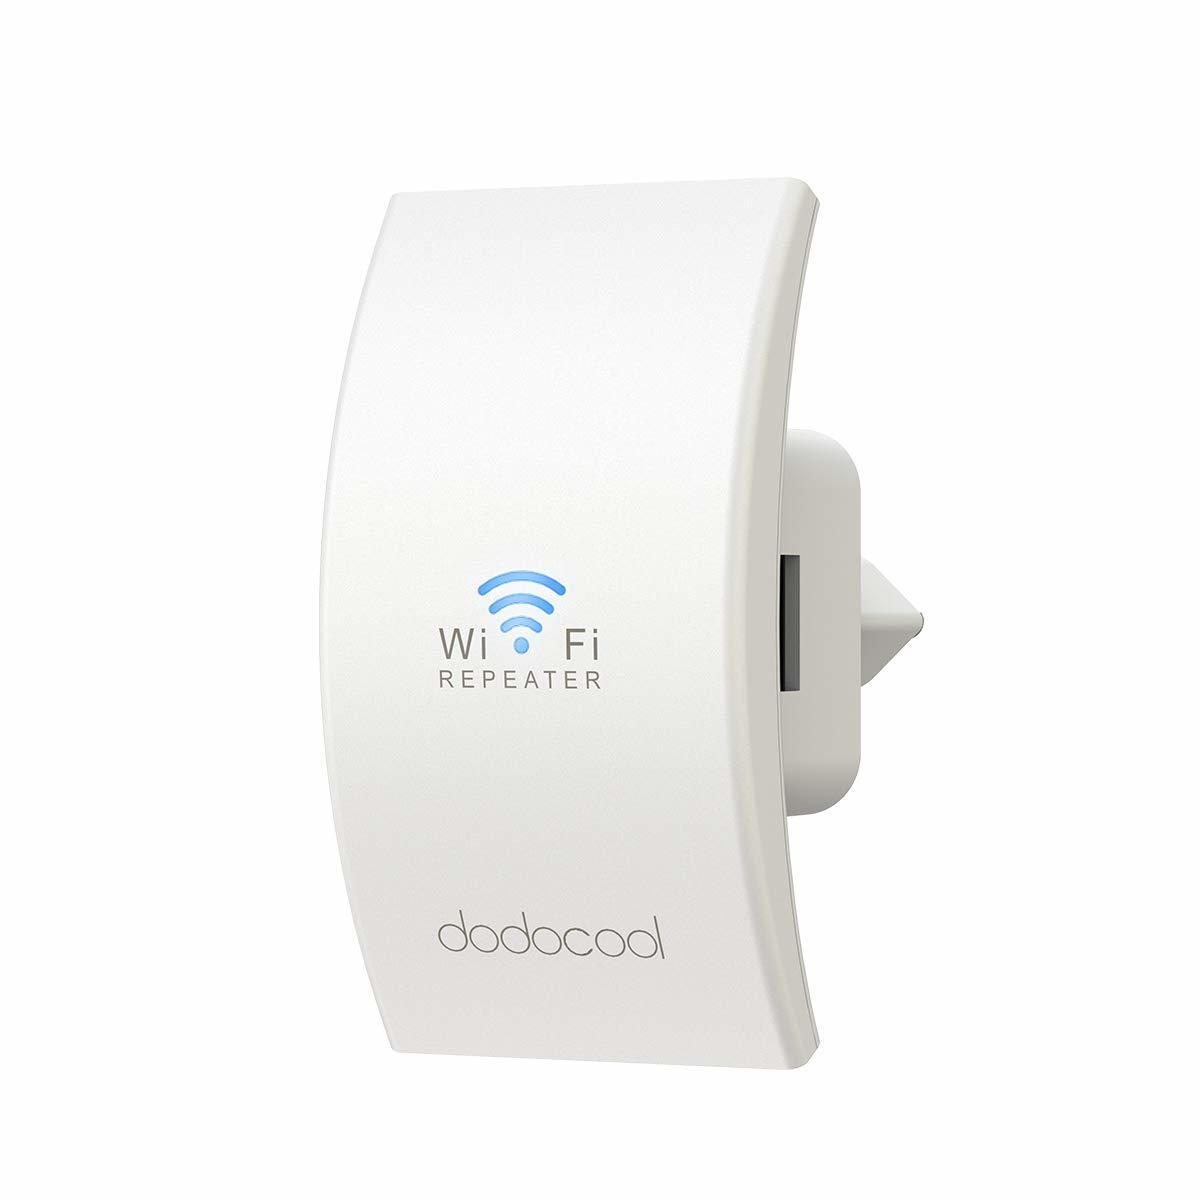 dodocool Répéteur WiFi N300